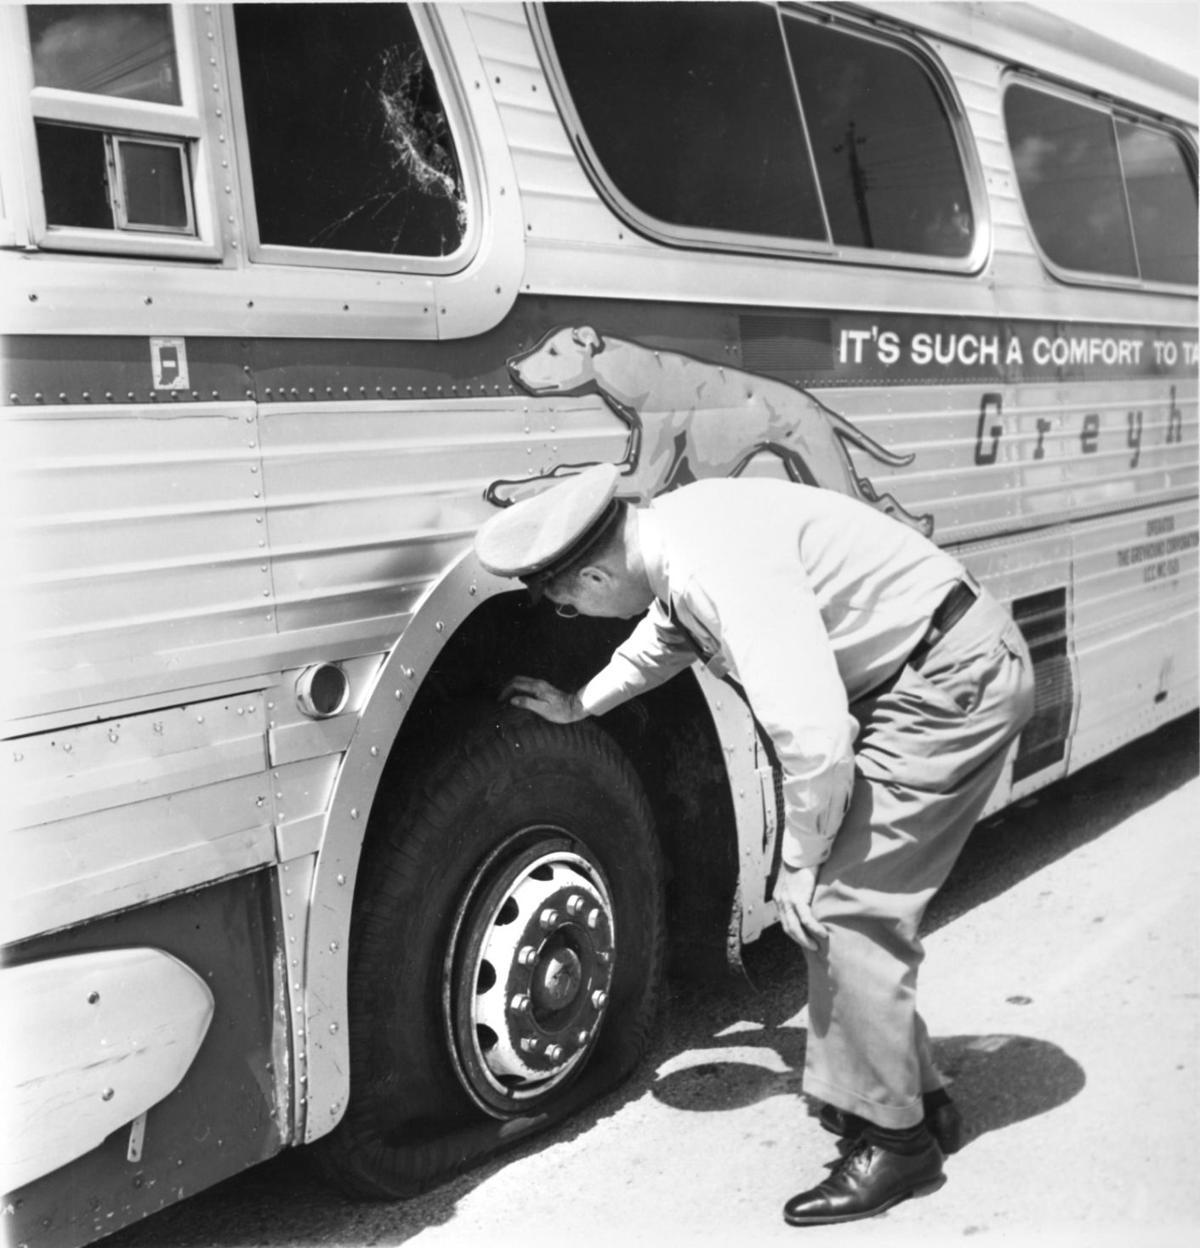 Greyhound flat tire